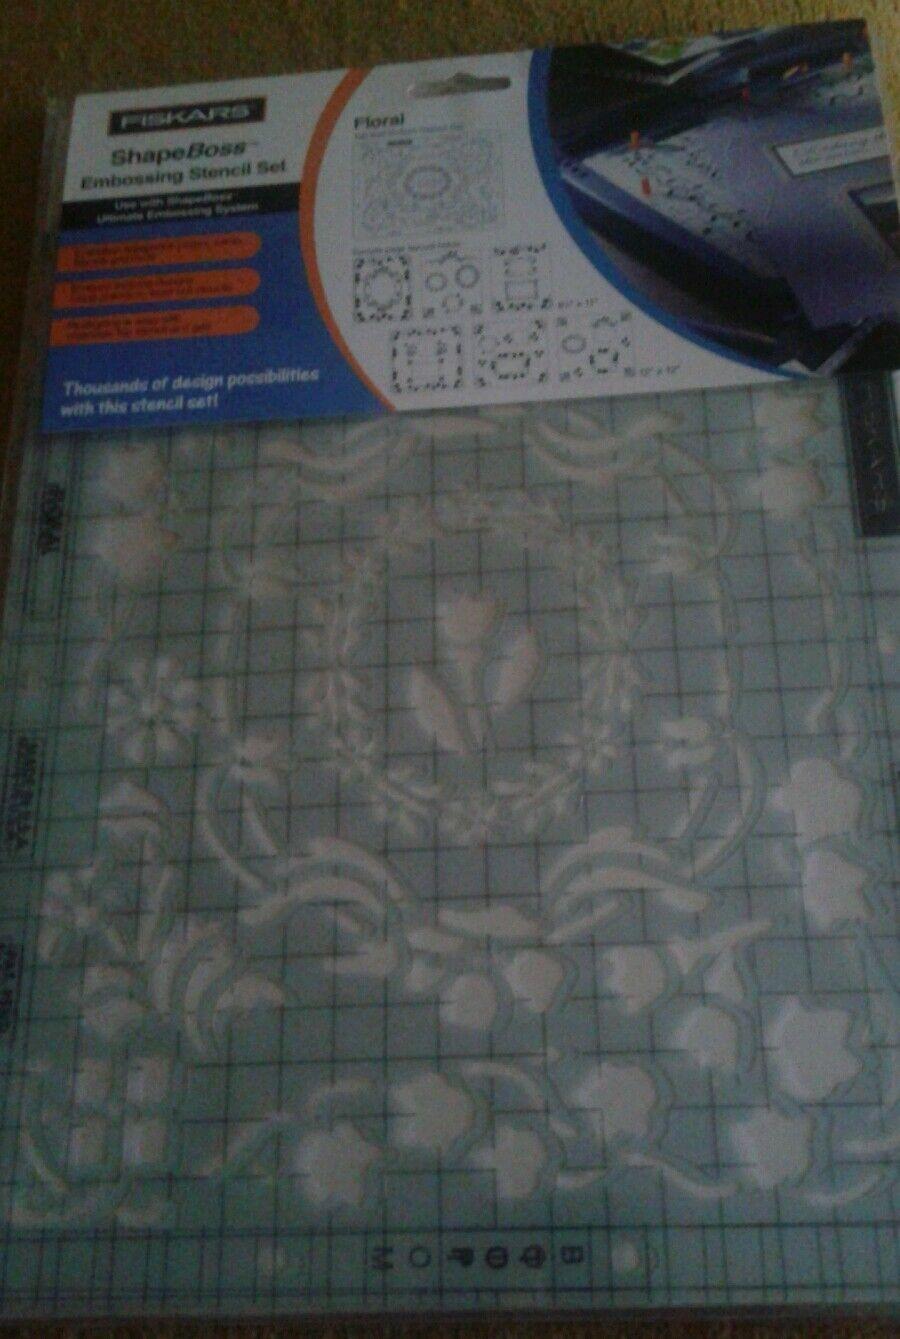 Fiskars Stencil Floral 5620 for Shape Boss Embossing Set Scrapbook ...